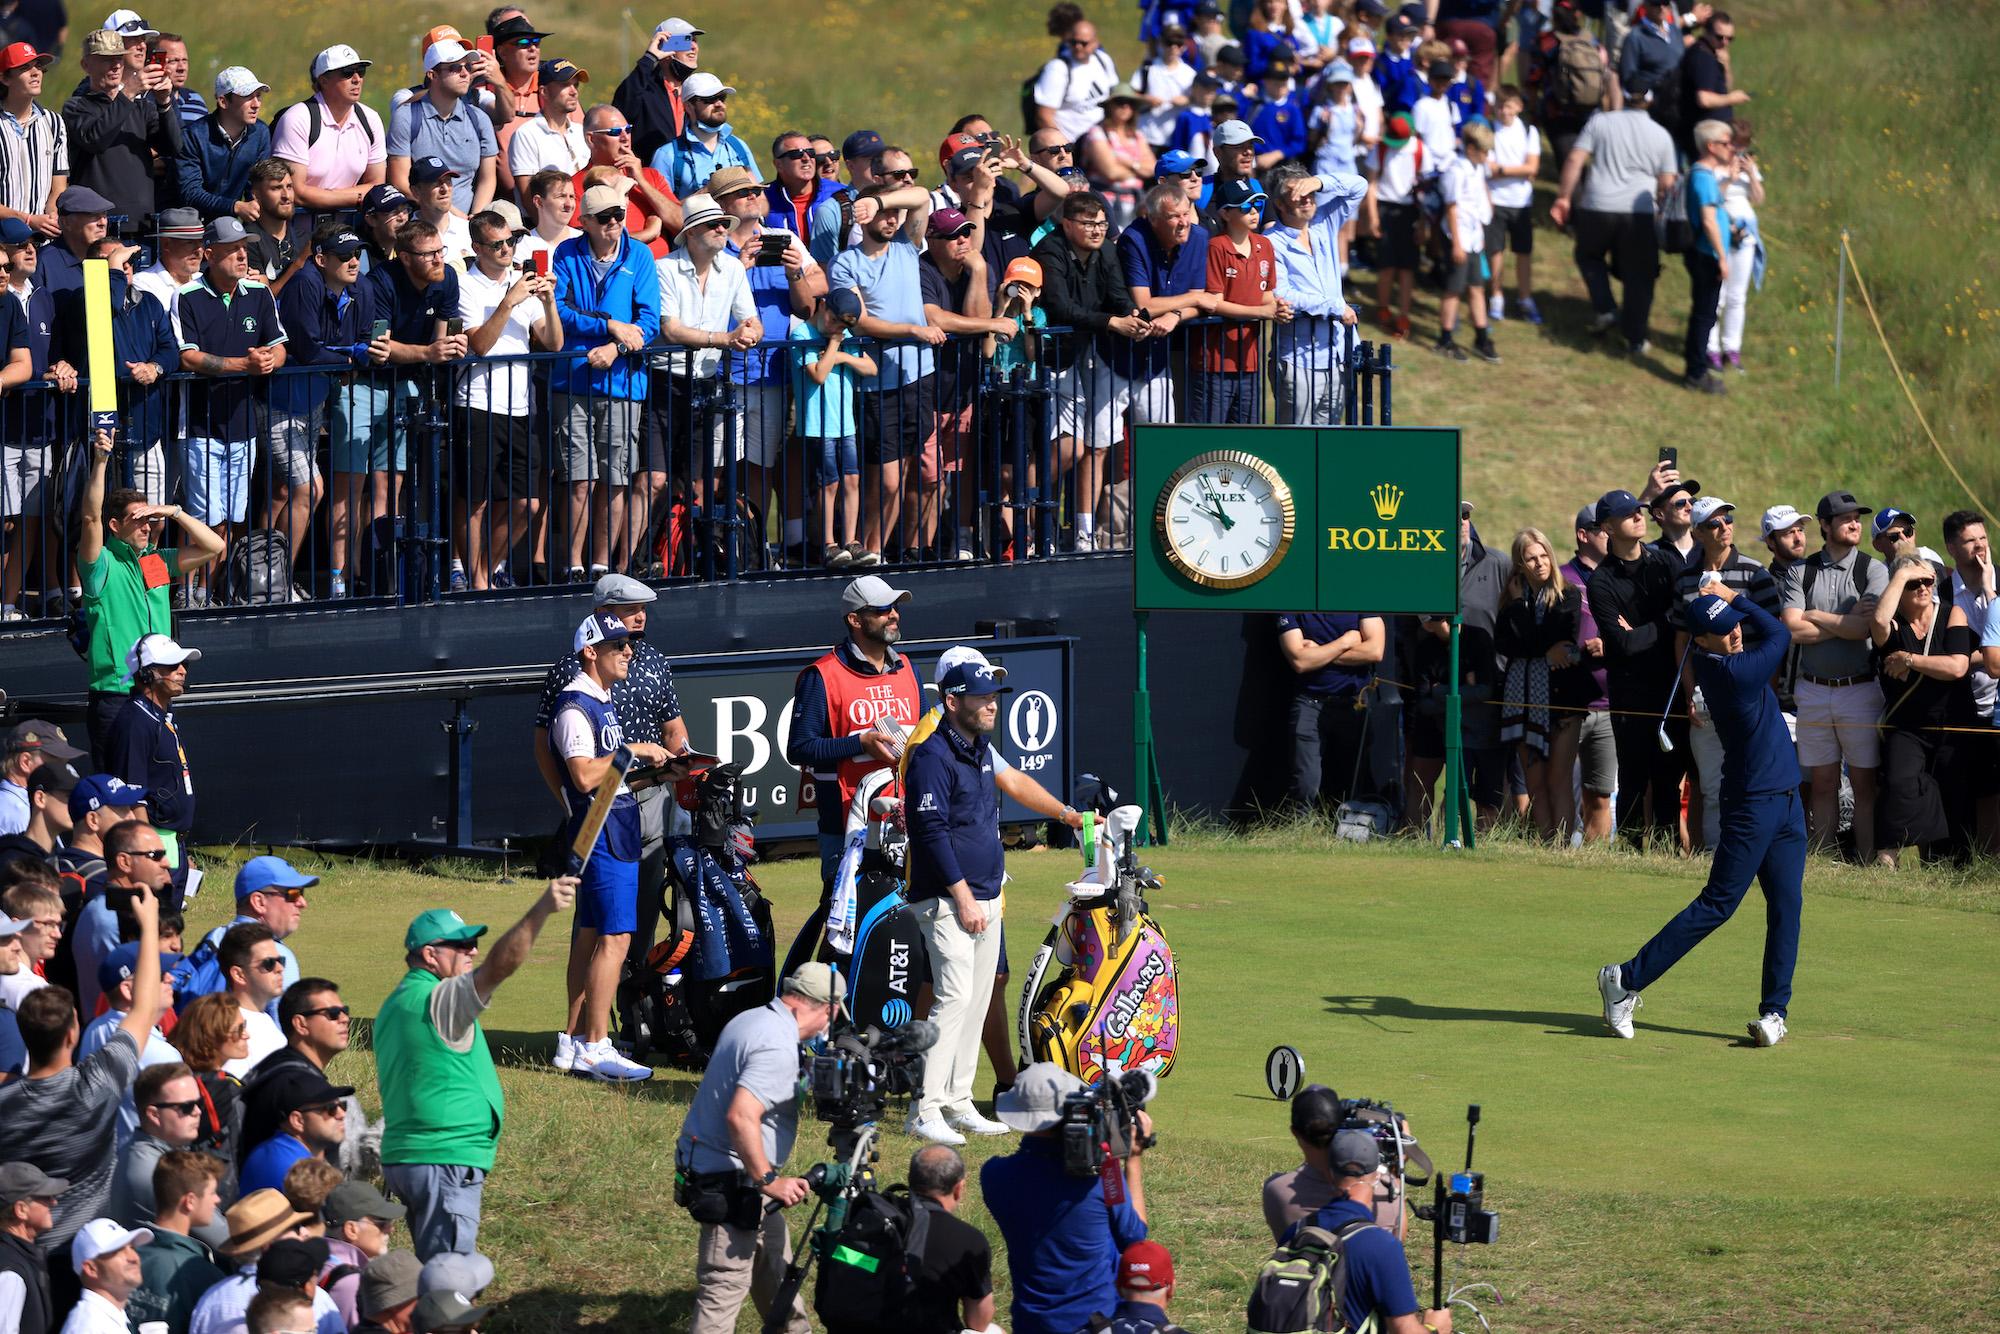 2021 Open Championship: Round 1 - Tee Shot on First Tee Box